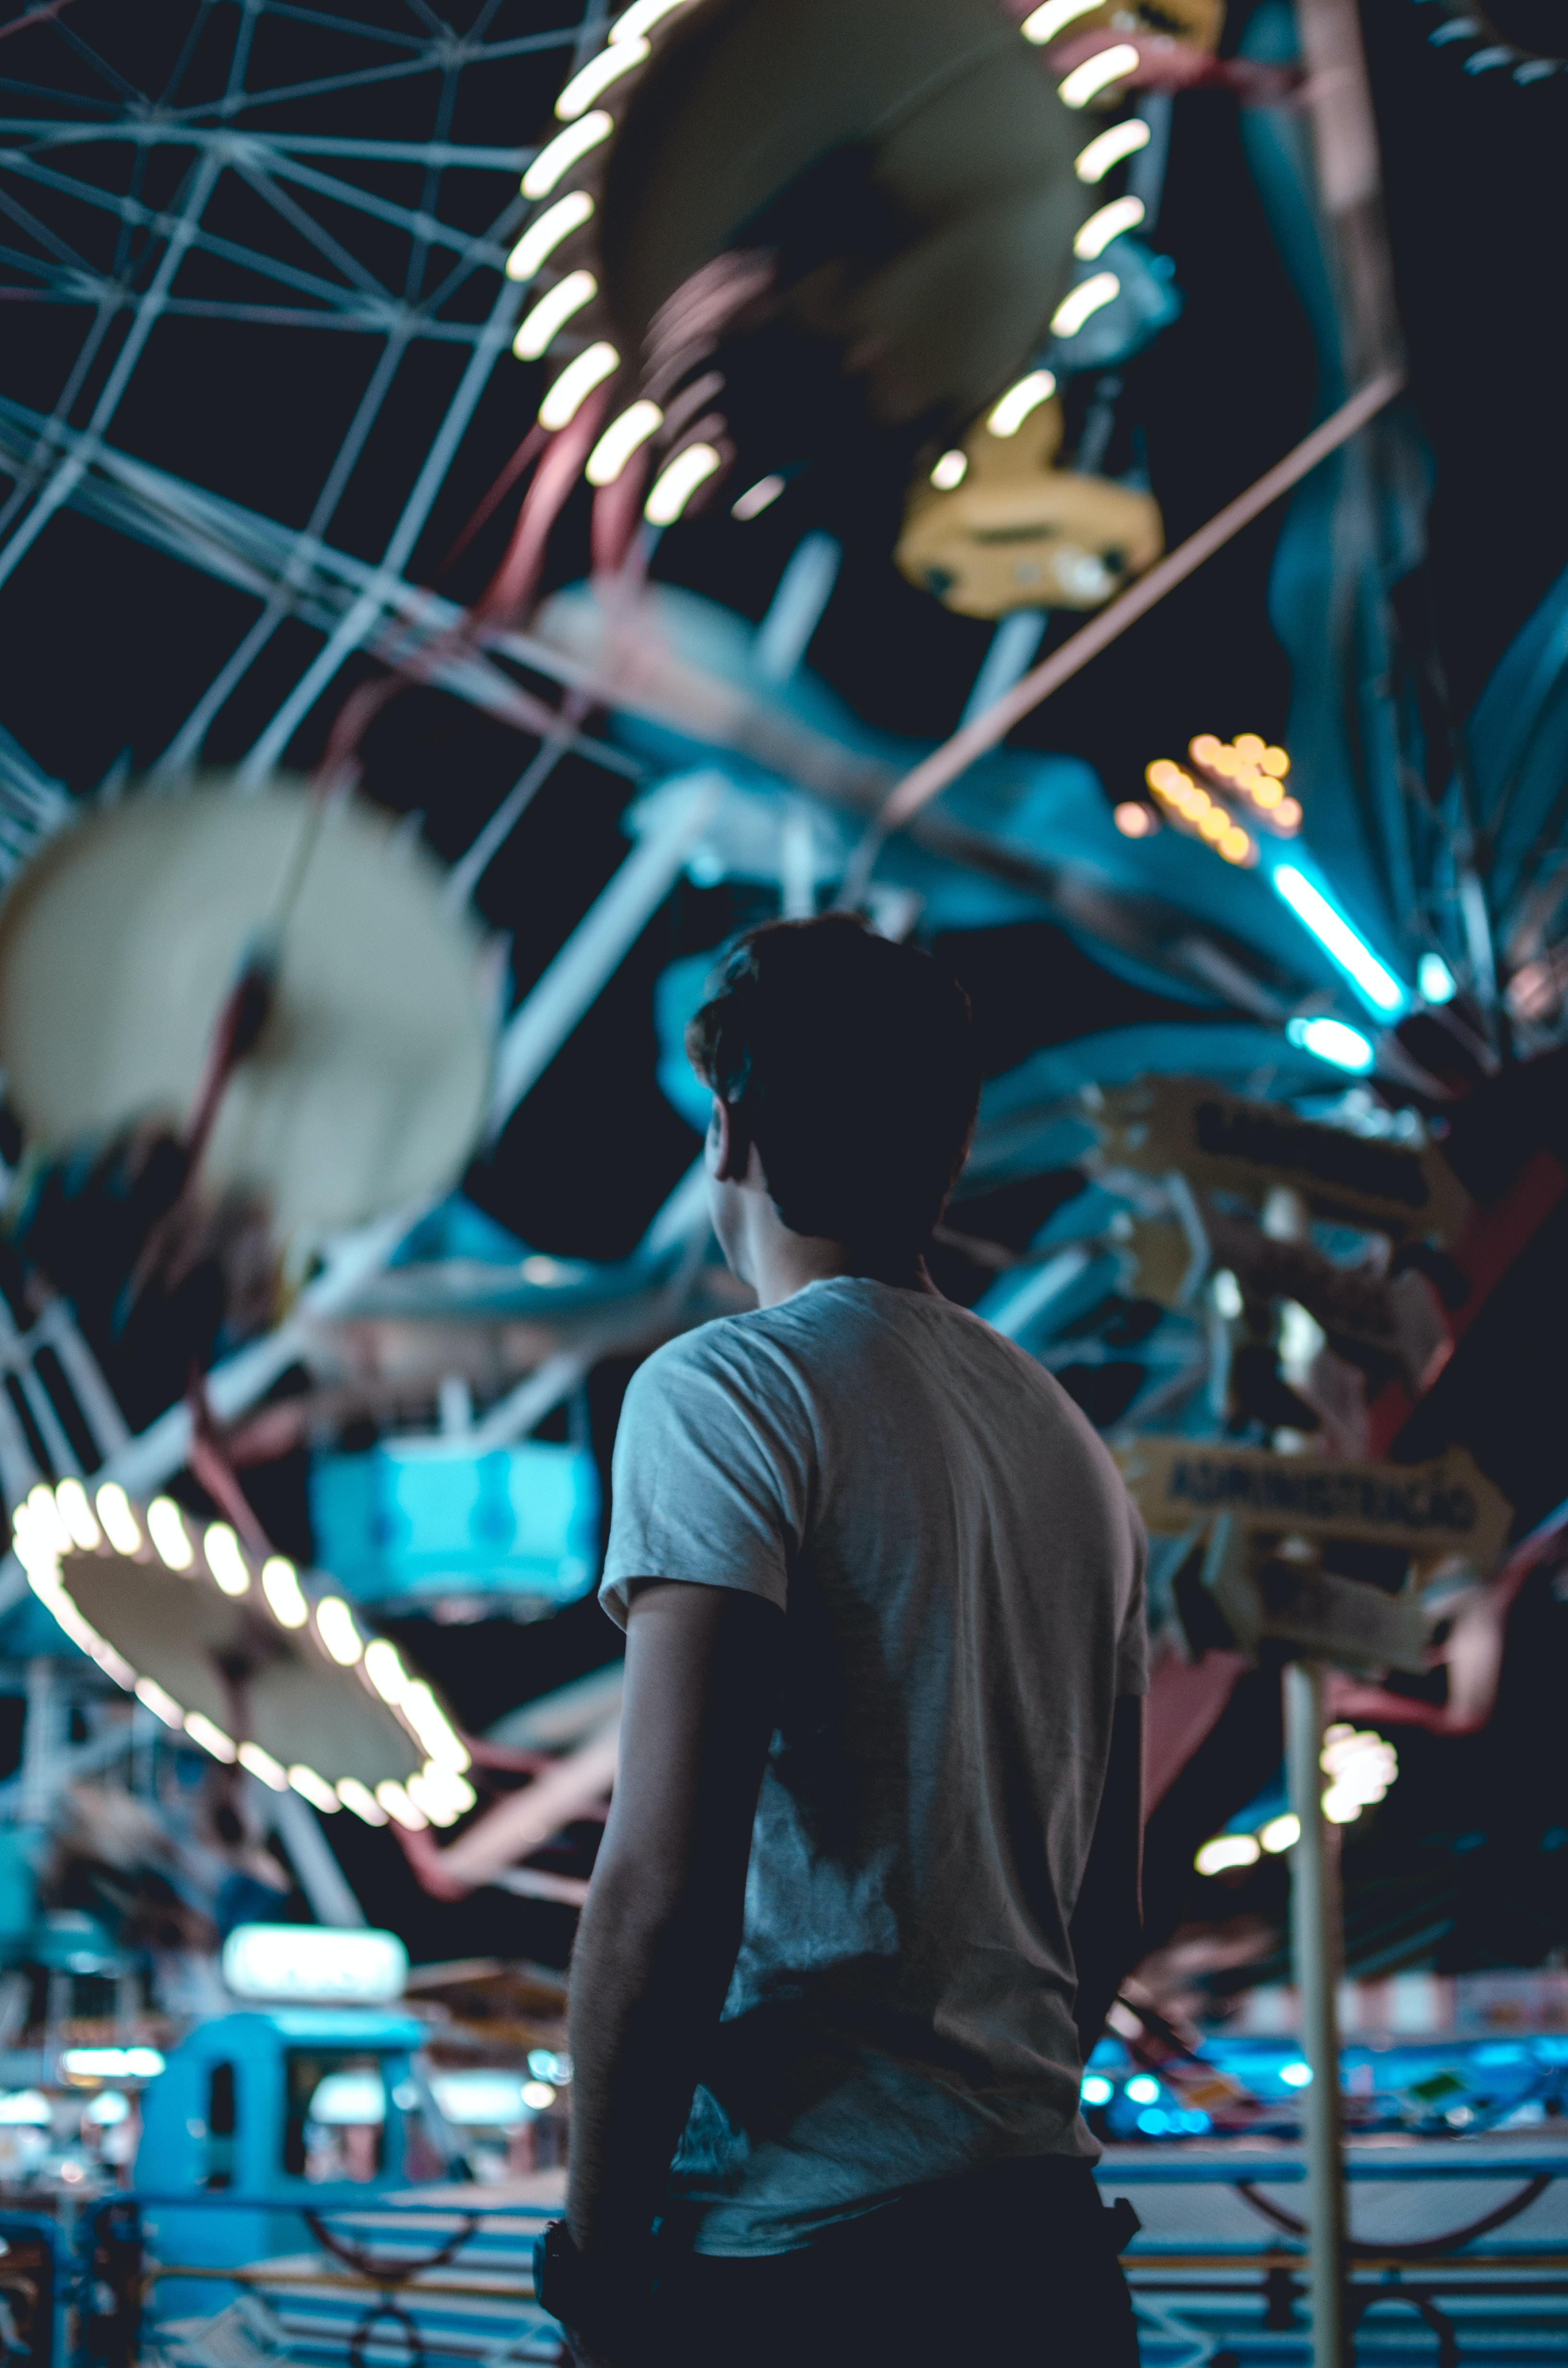 man standing near amusement park during daytime